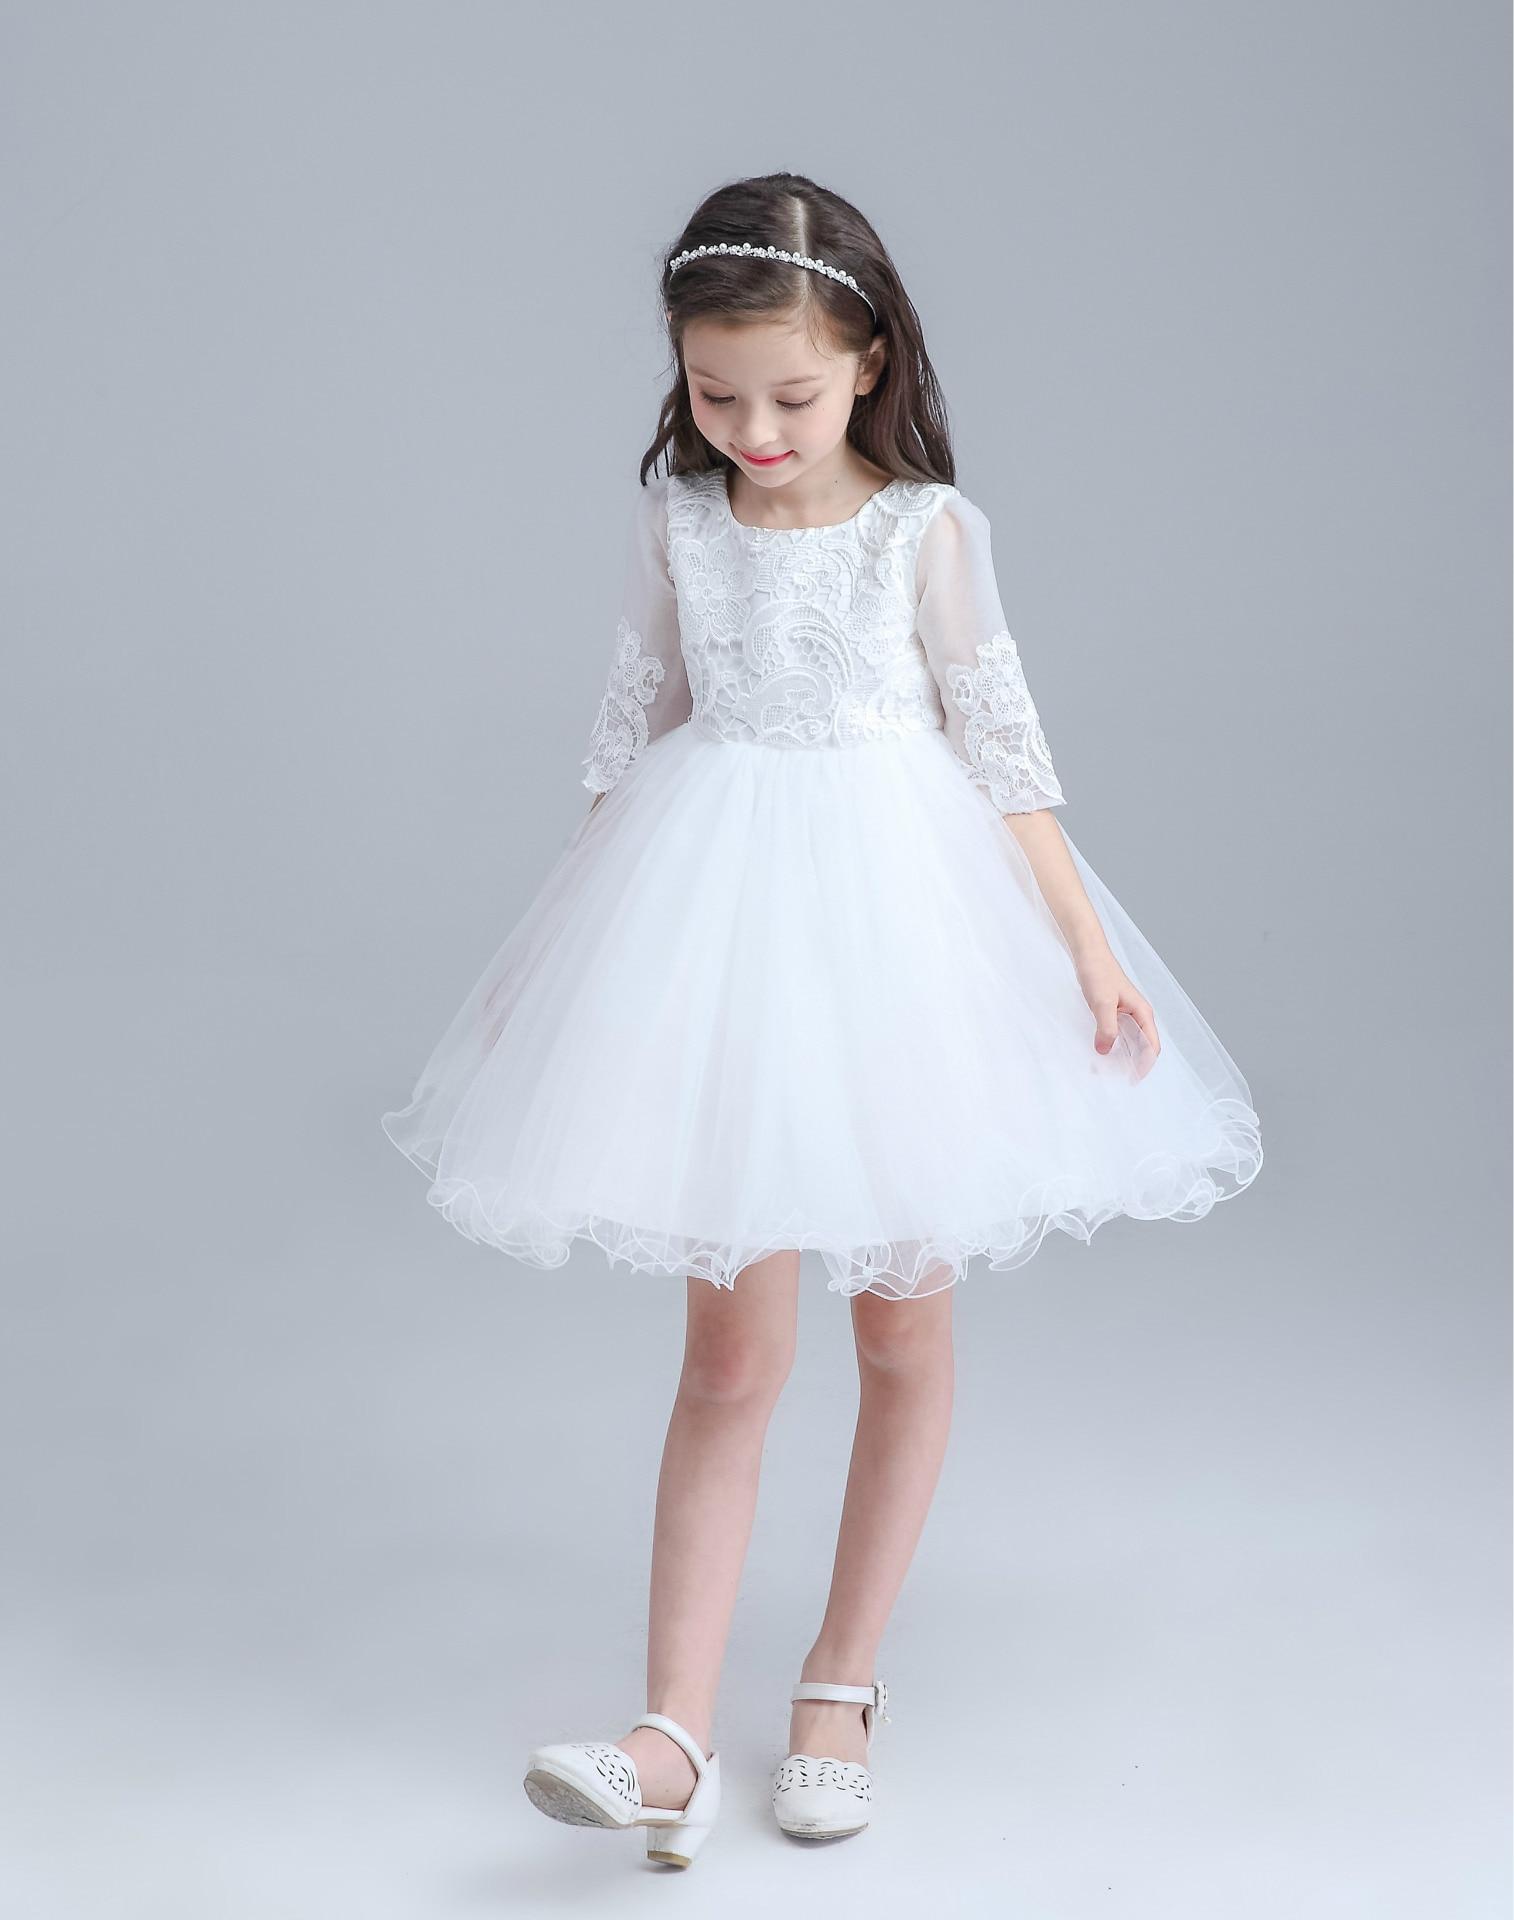 2016 Girls Summer Dress Kids Girls White Wedding Birthday Costume Flower Girl Dresses with Big Bow Teenage Ball Gowns<br>